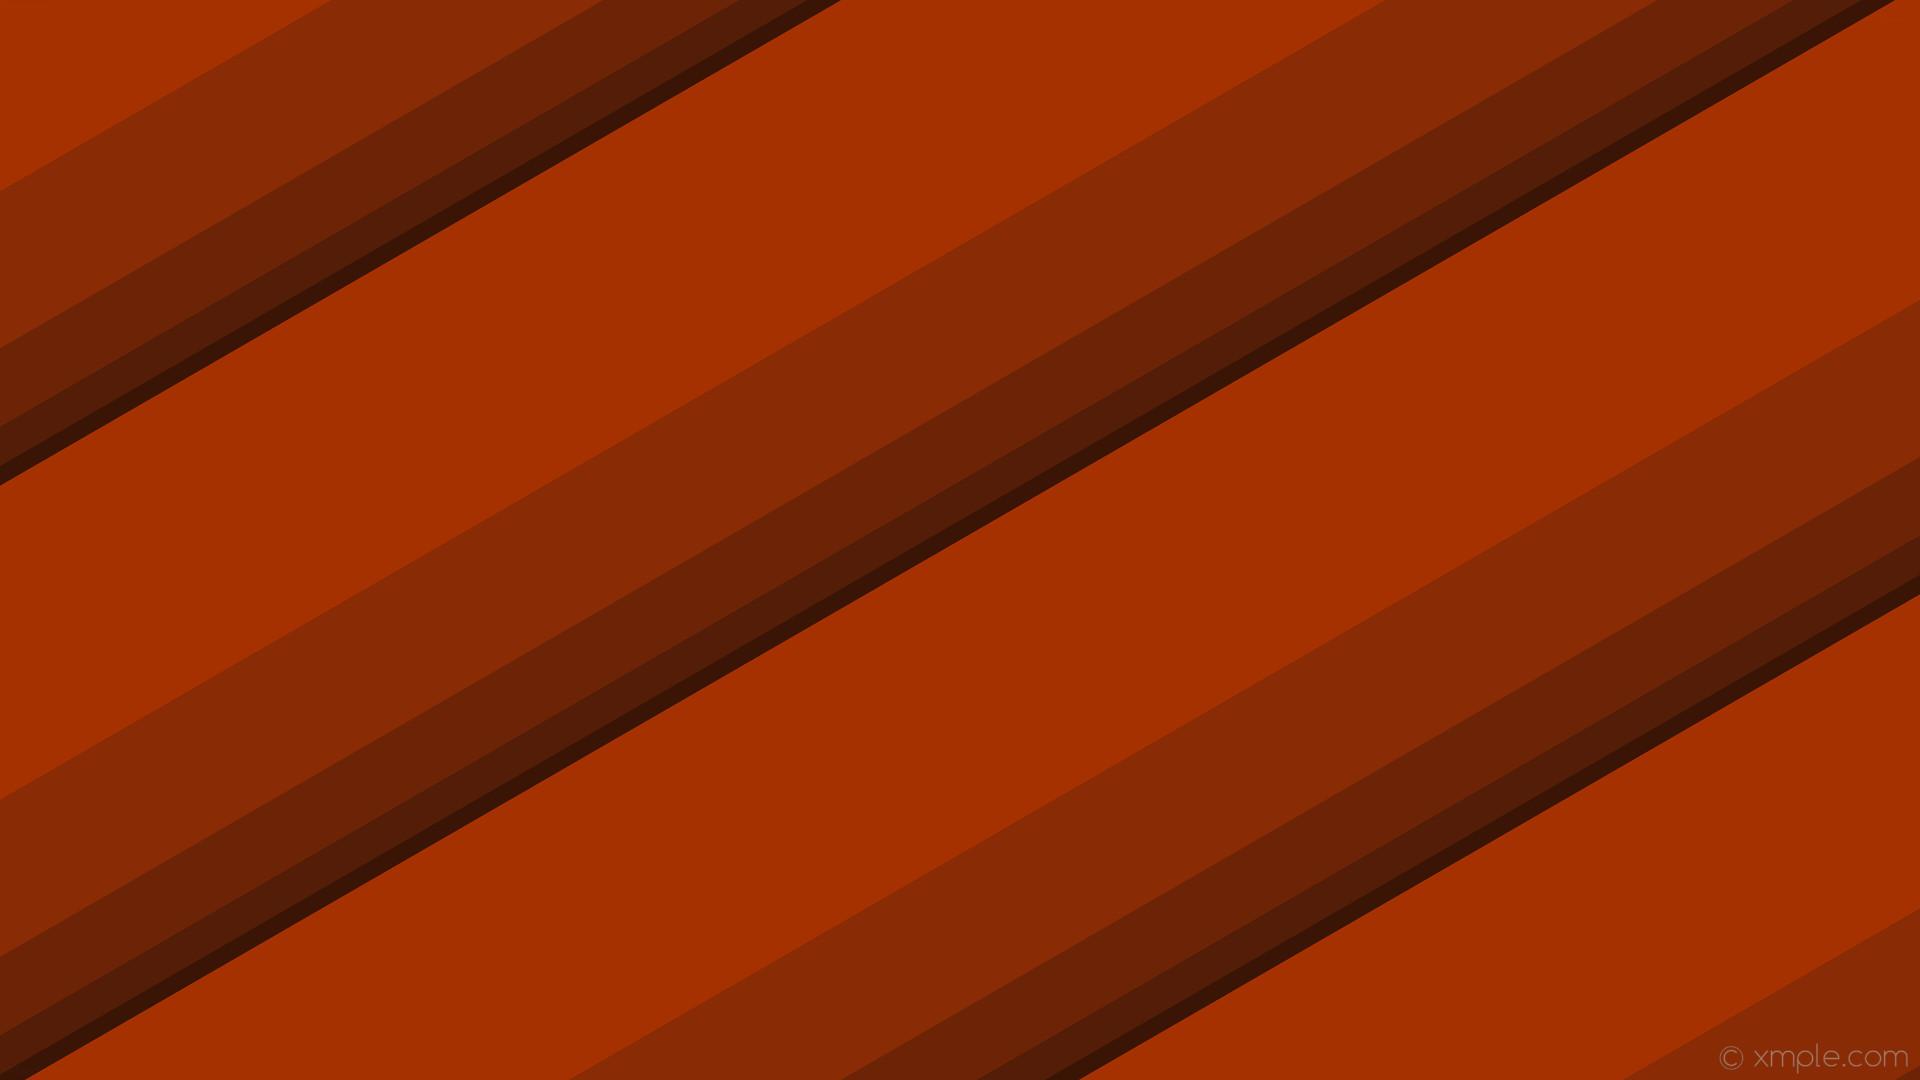 wallpaper streaks orange lines stripes dark orange #3a1506 #531d07 #6d2406  #892b04 #